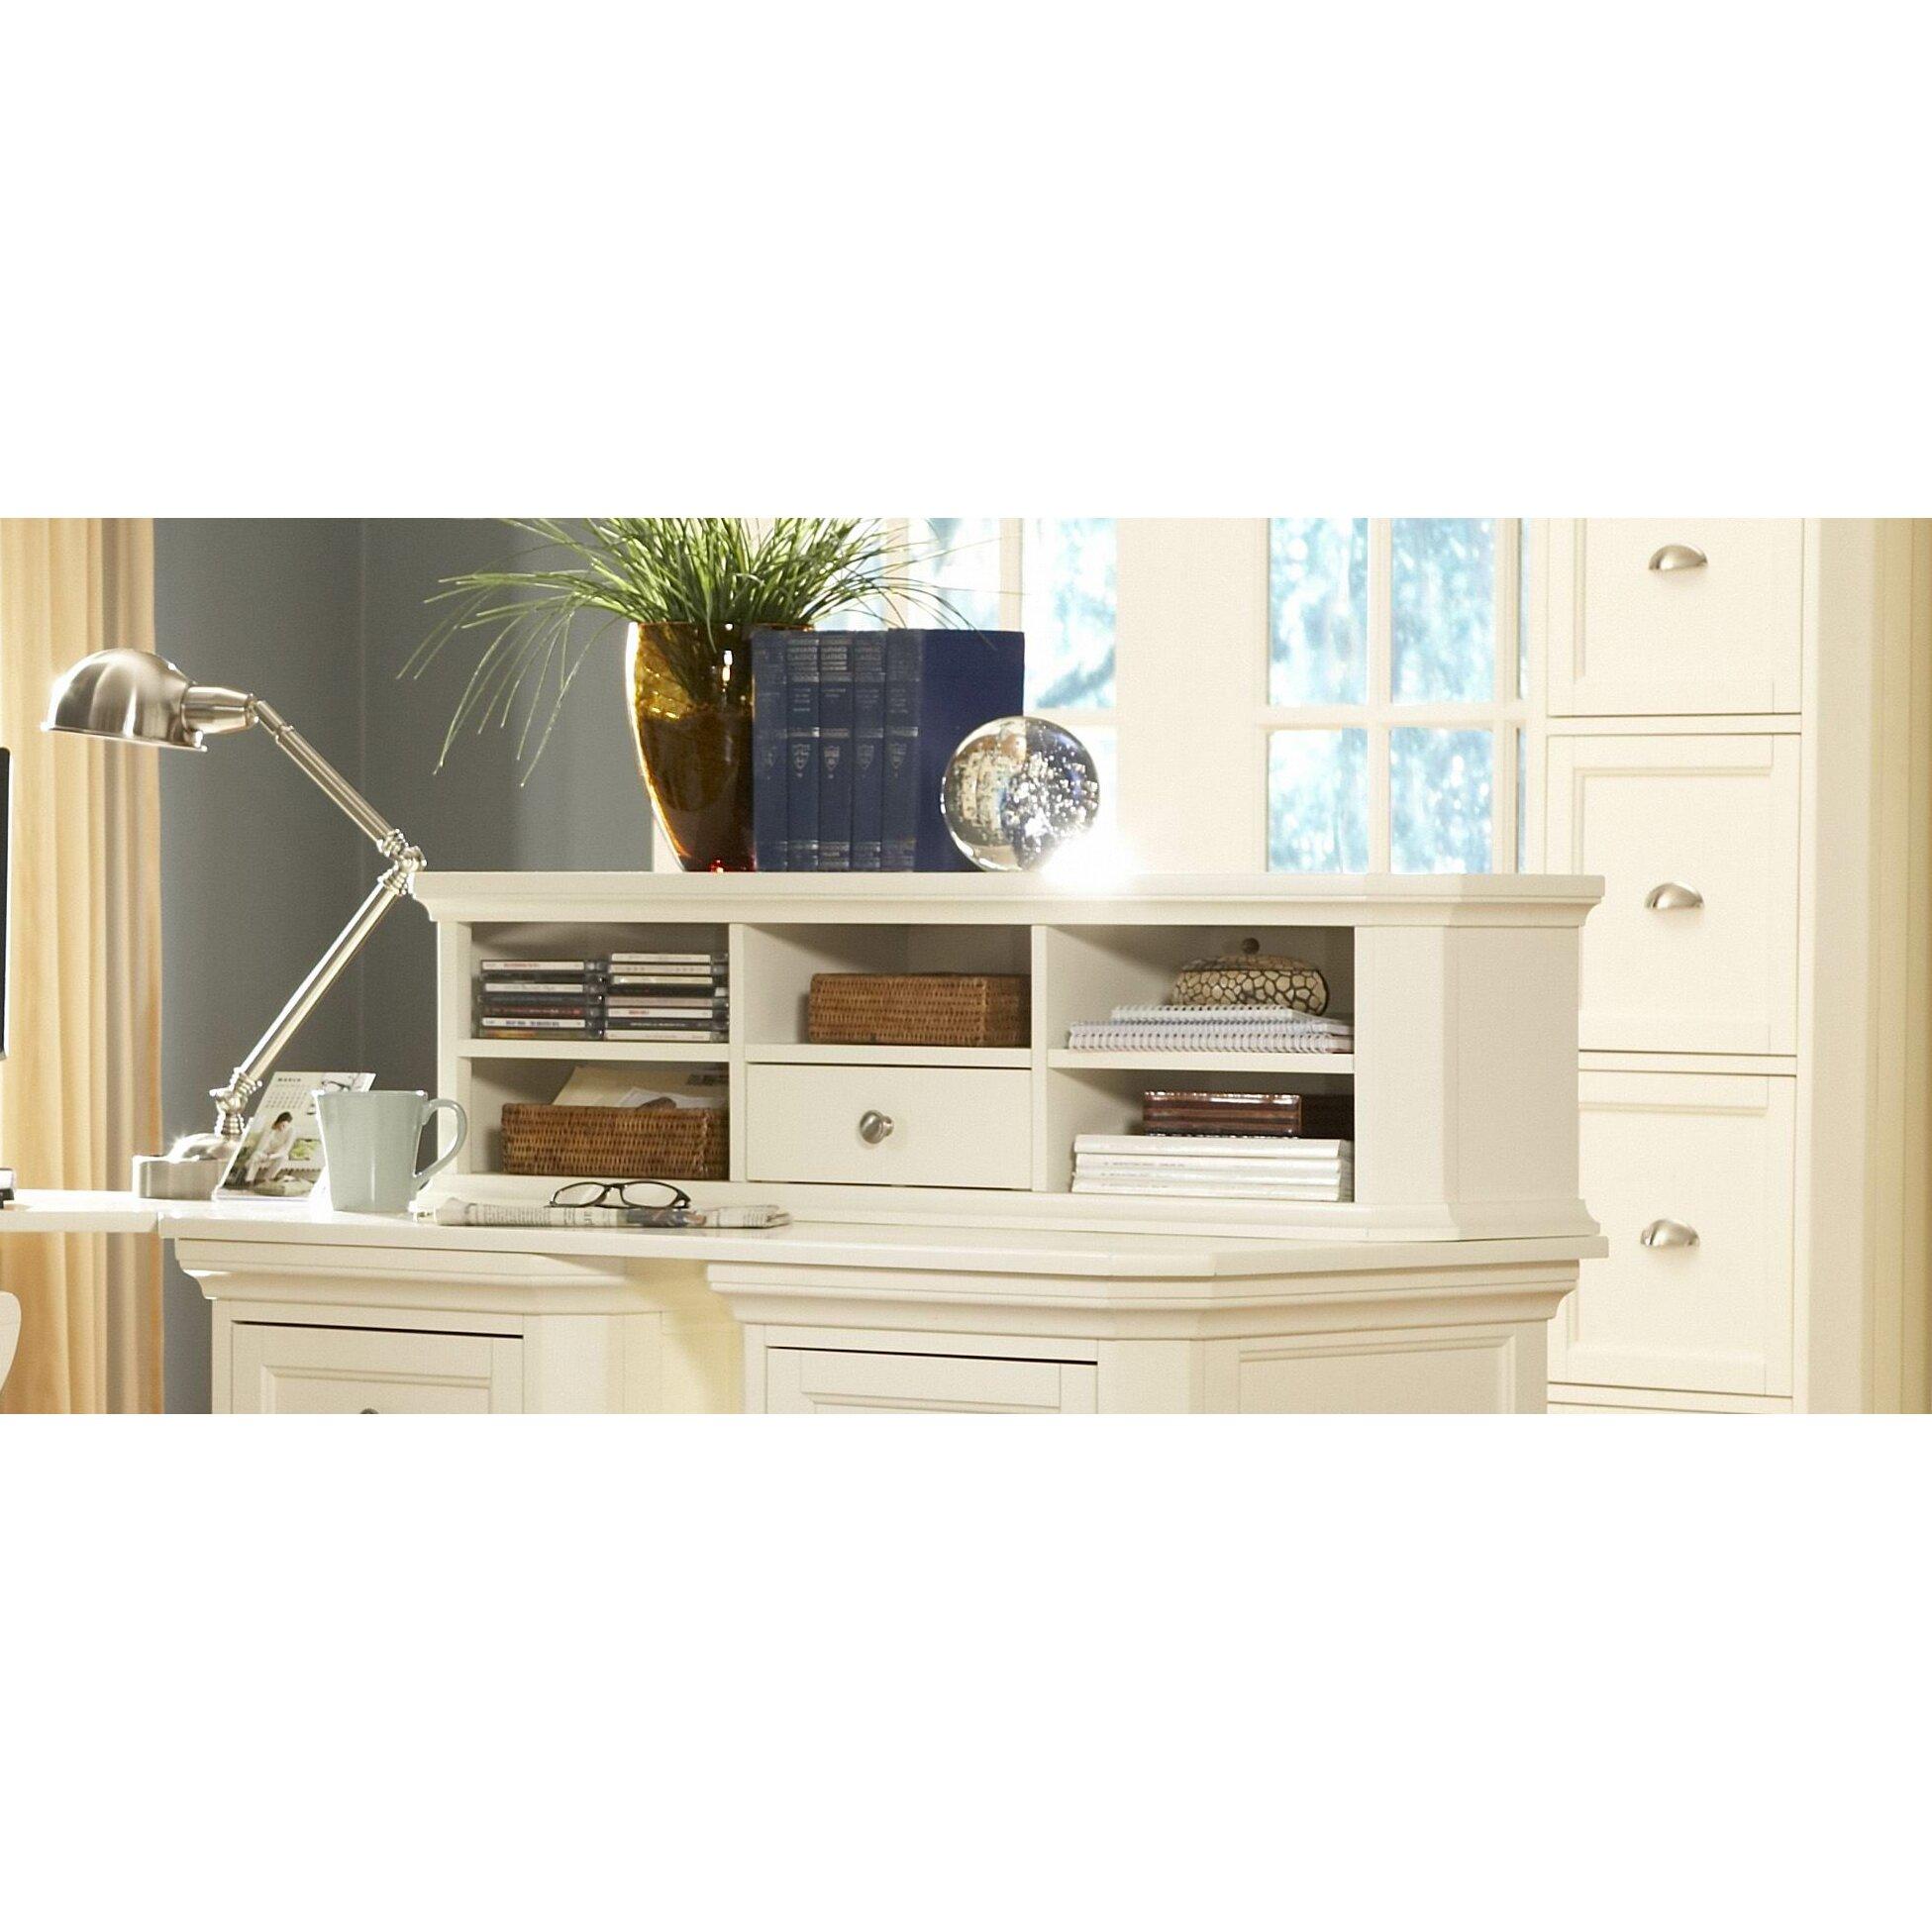 Woodbridge Kitchen Cabinets: Hanna Triple Length Cabinet Top